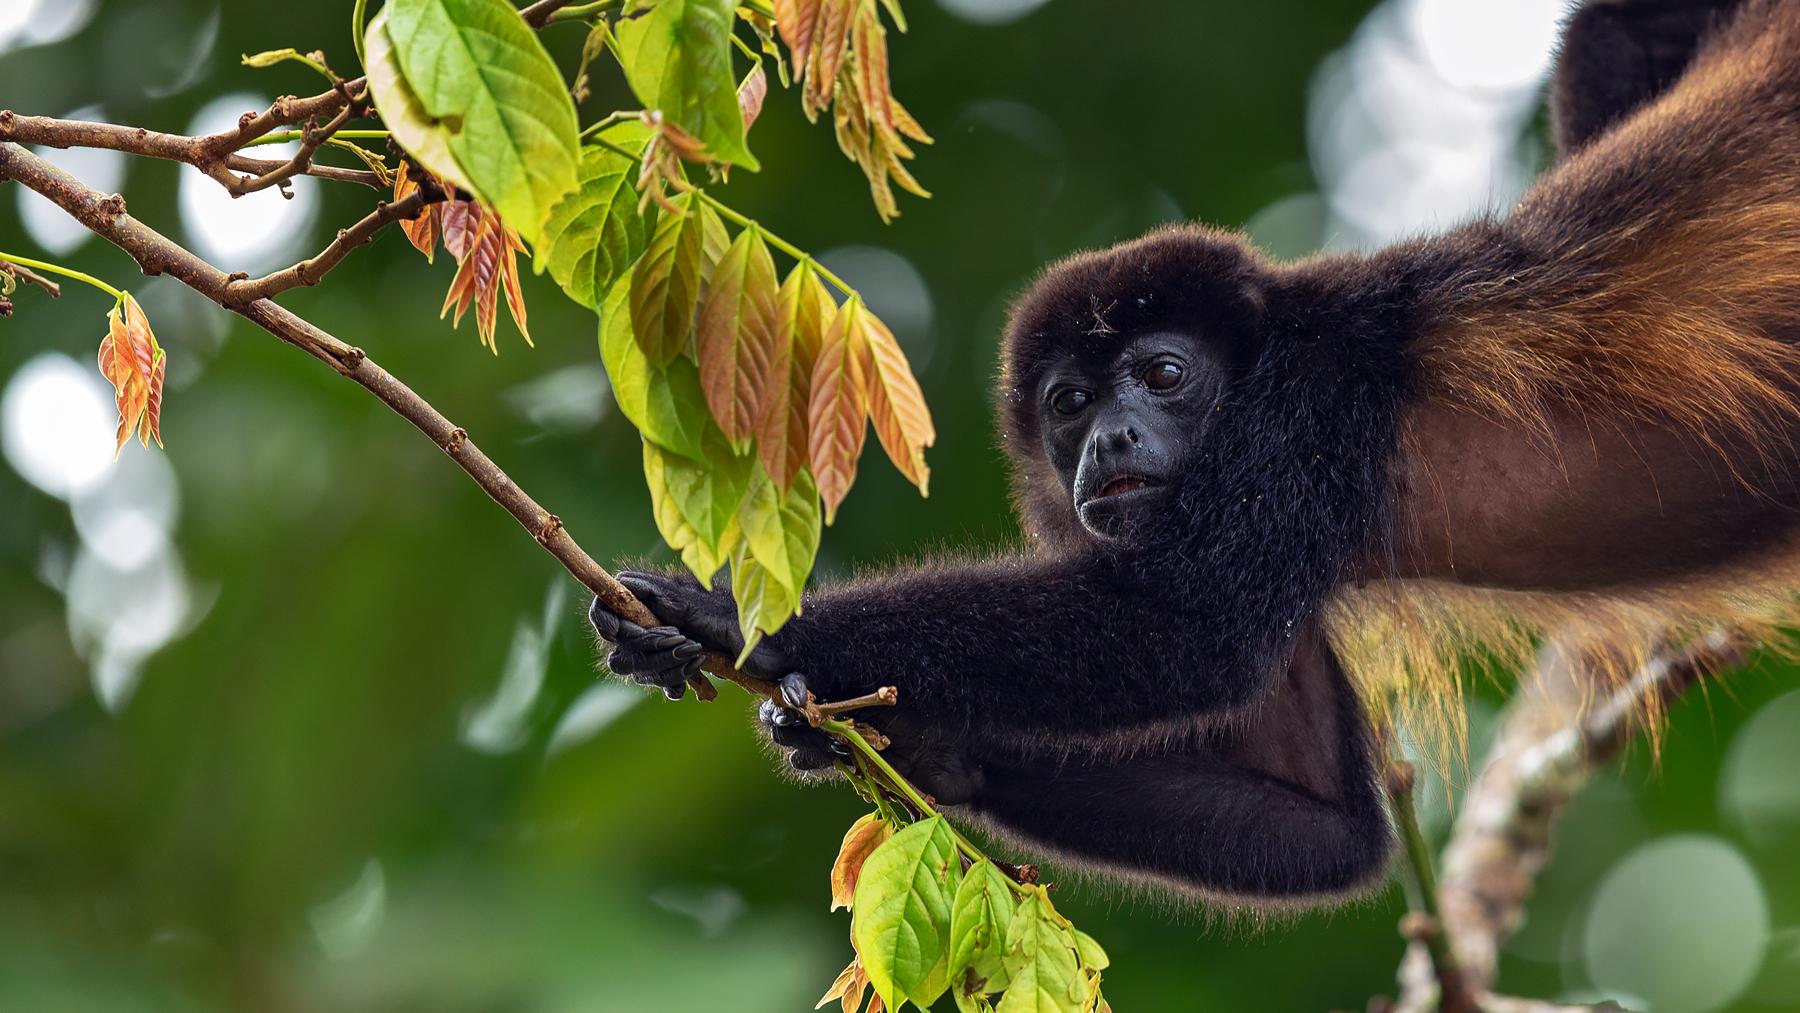 Mantled Howler Monkey @ Tortuguero National Park - Costa Rica